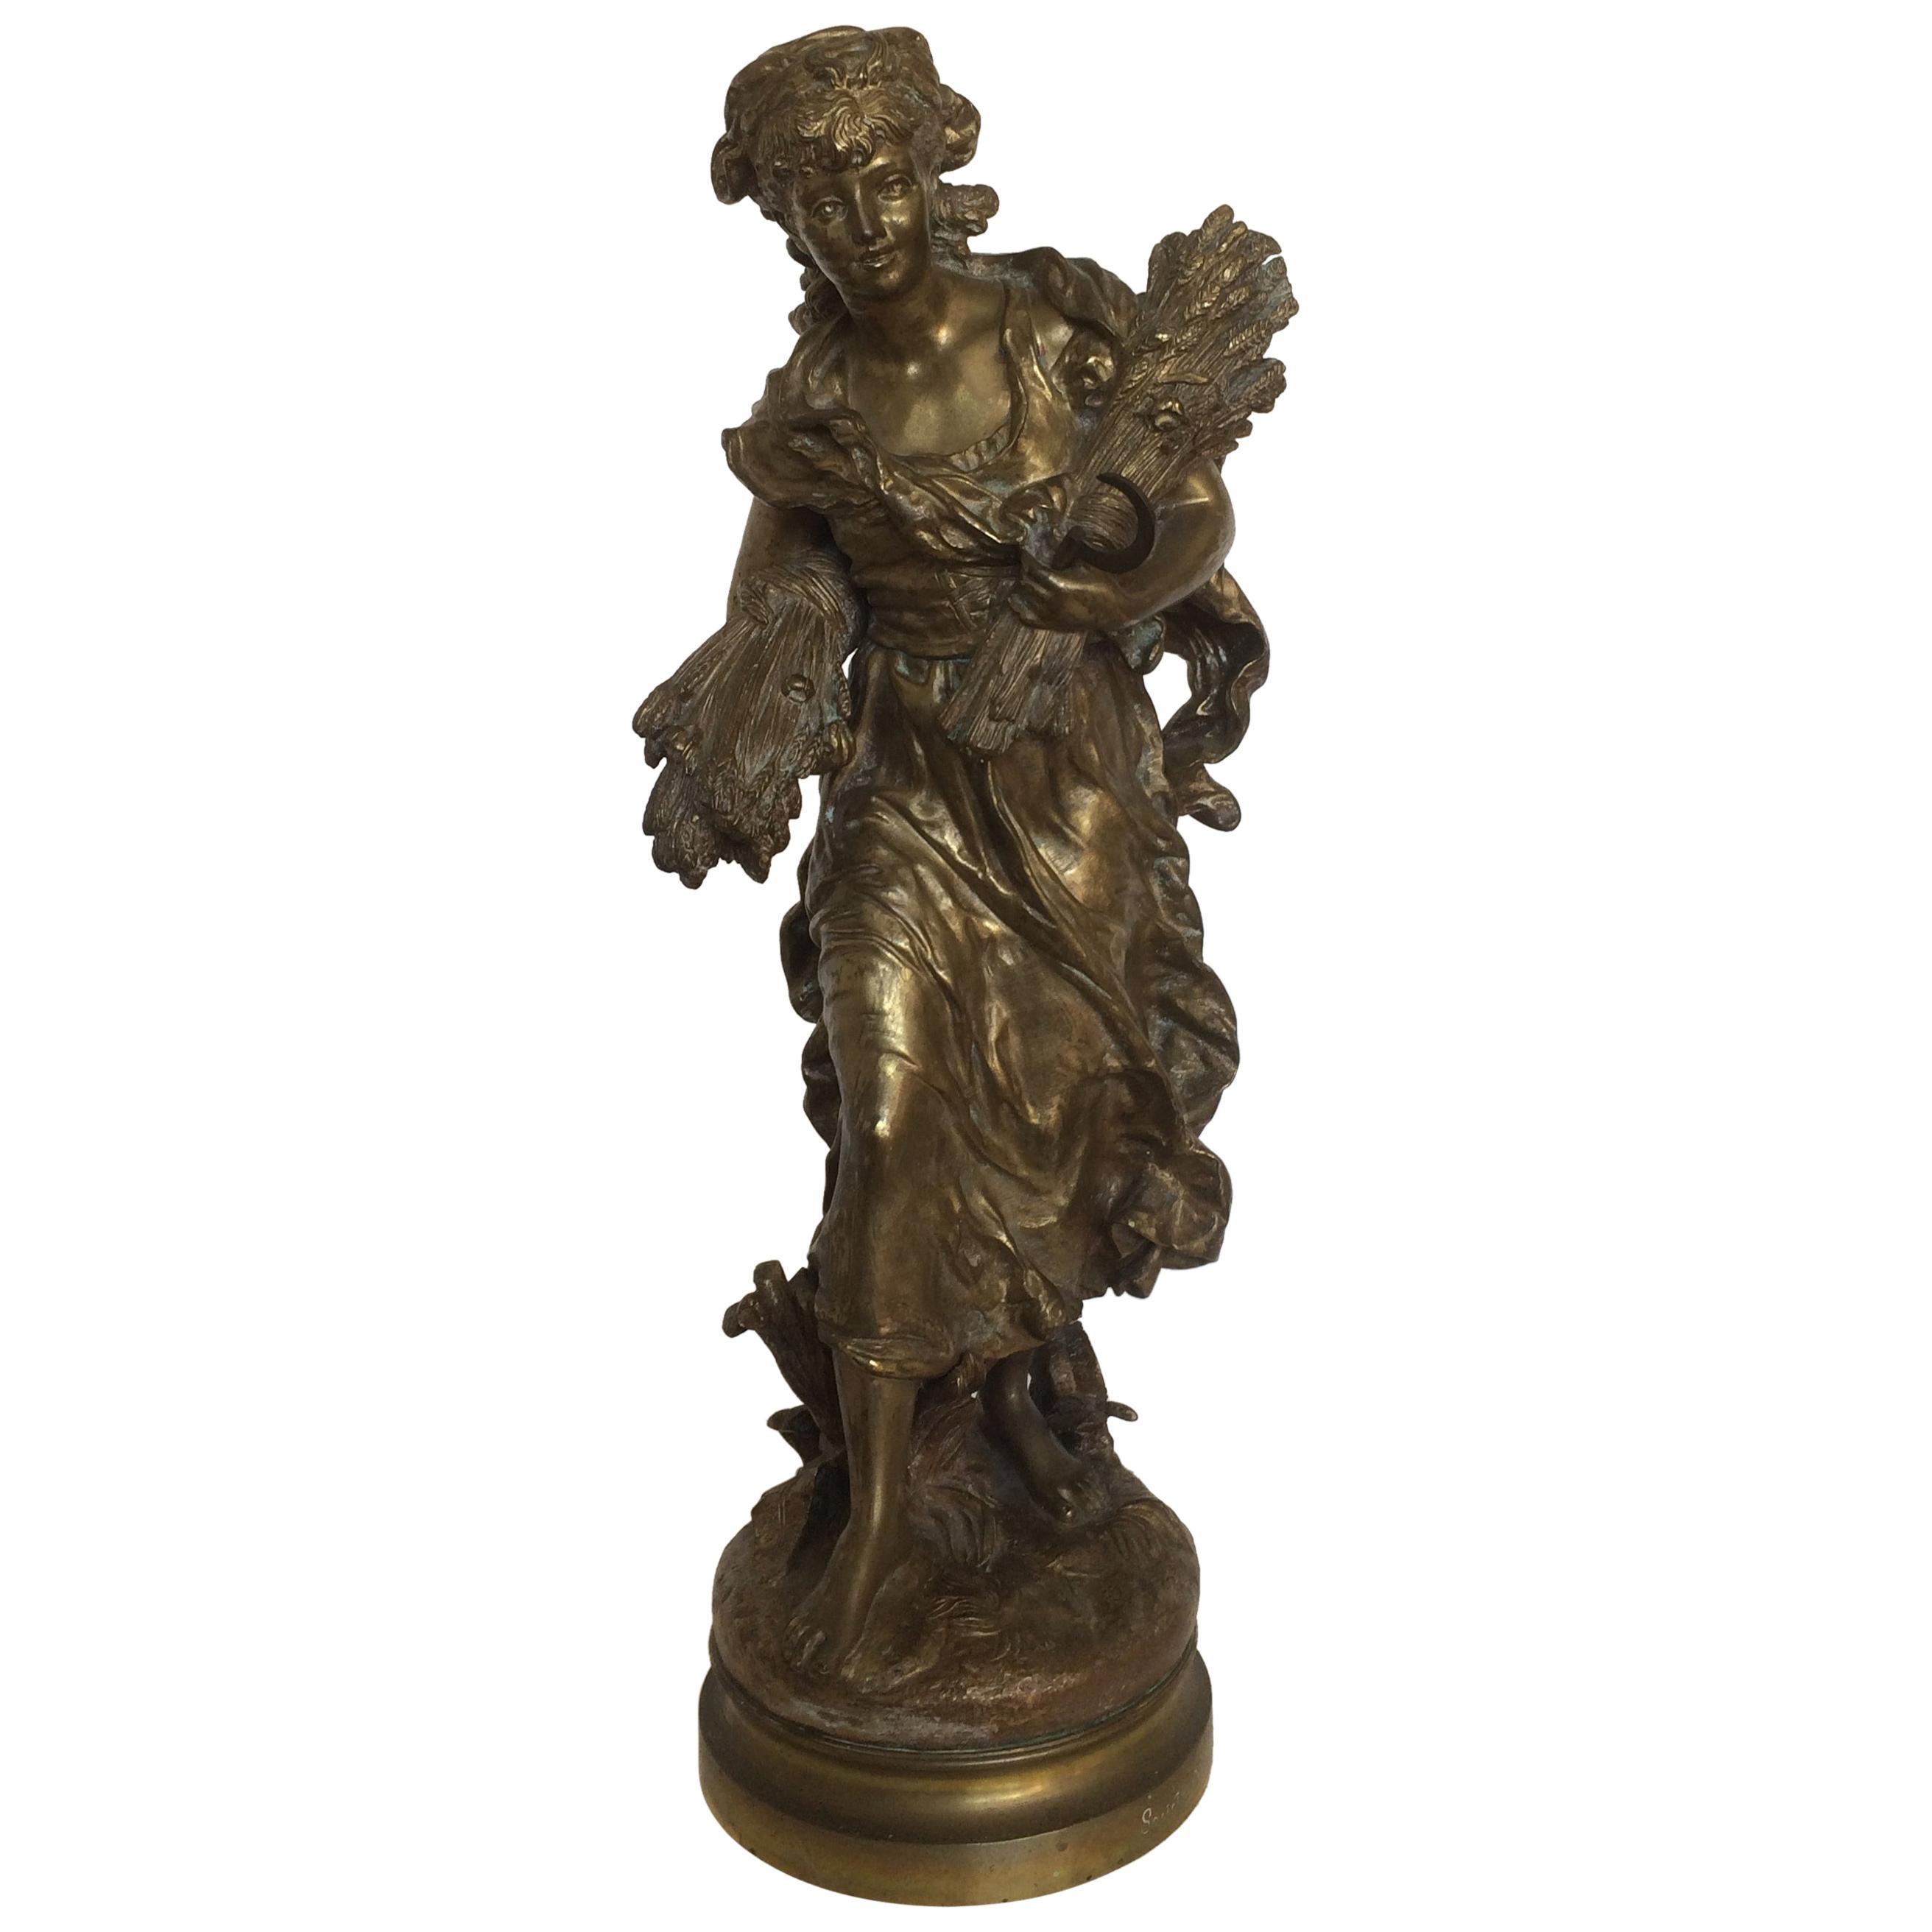 19th Century Bronze Sculpture by Hippolyte Moreau